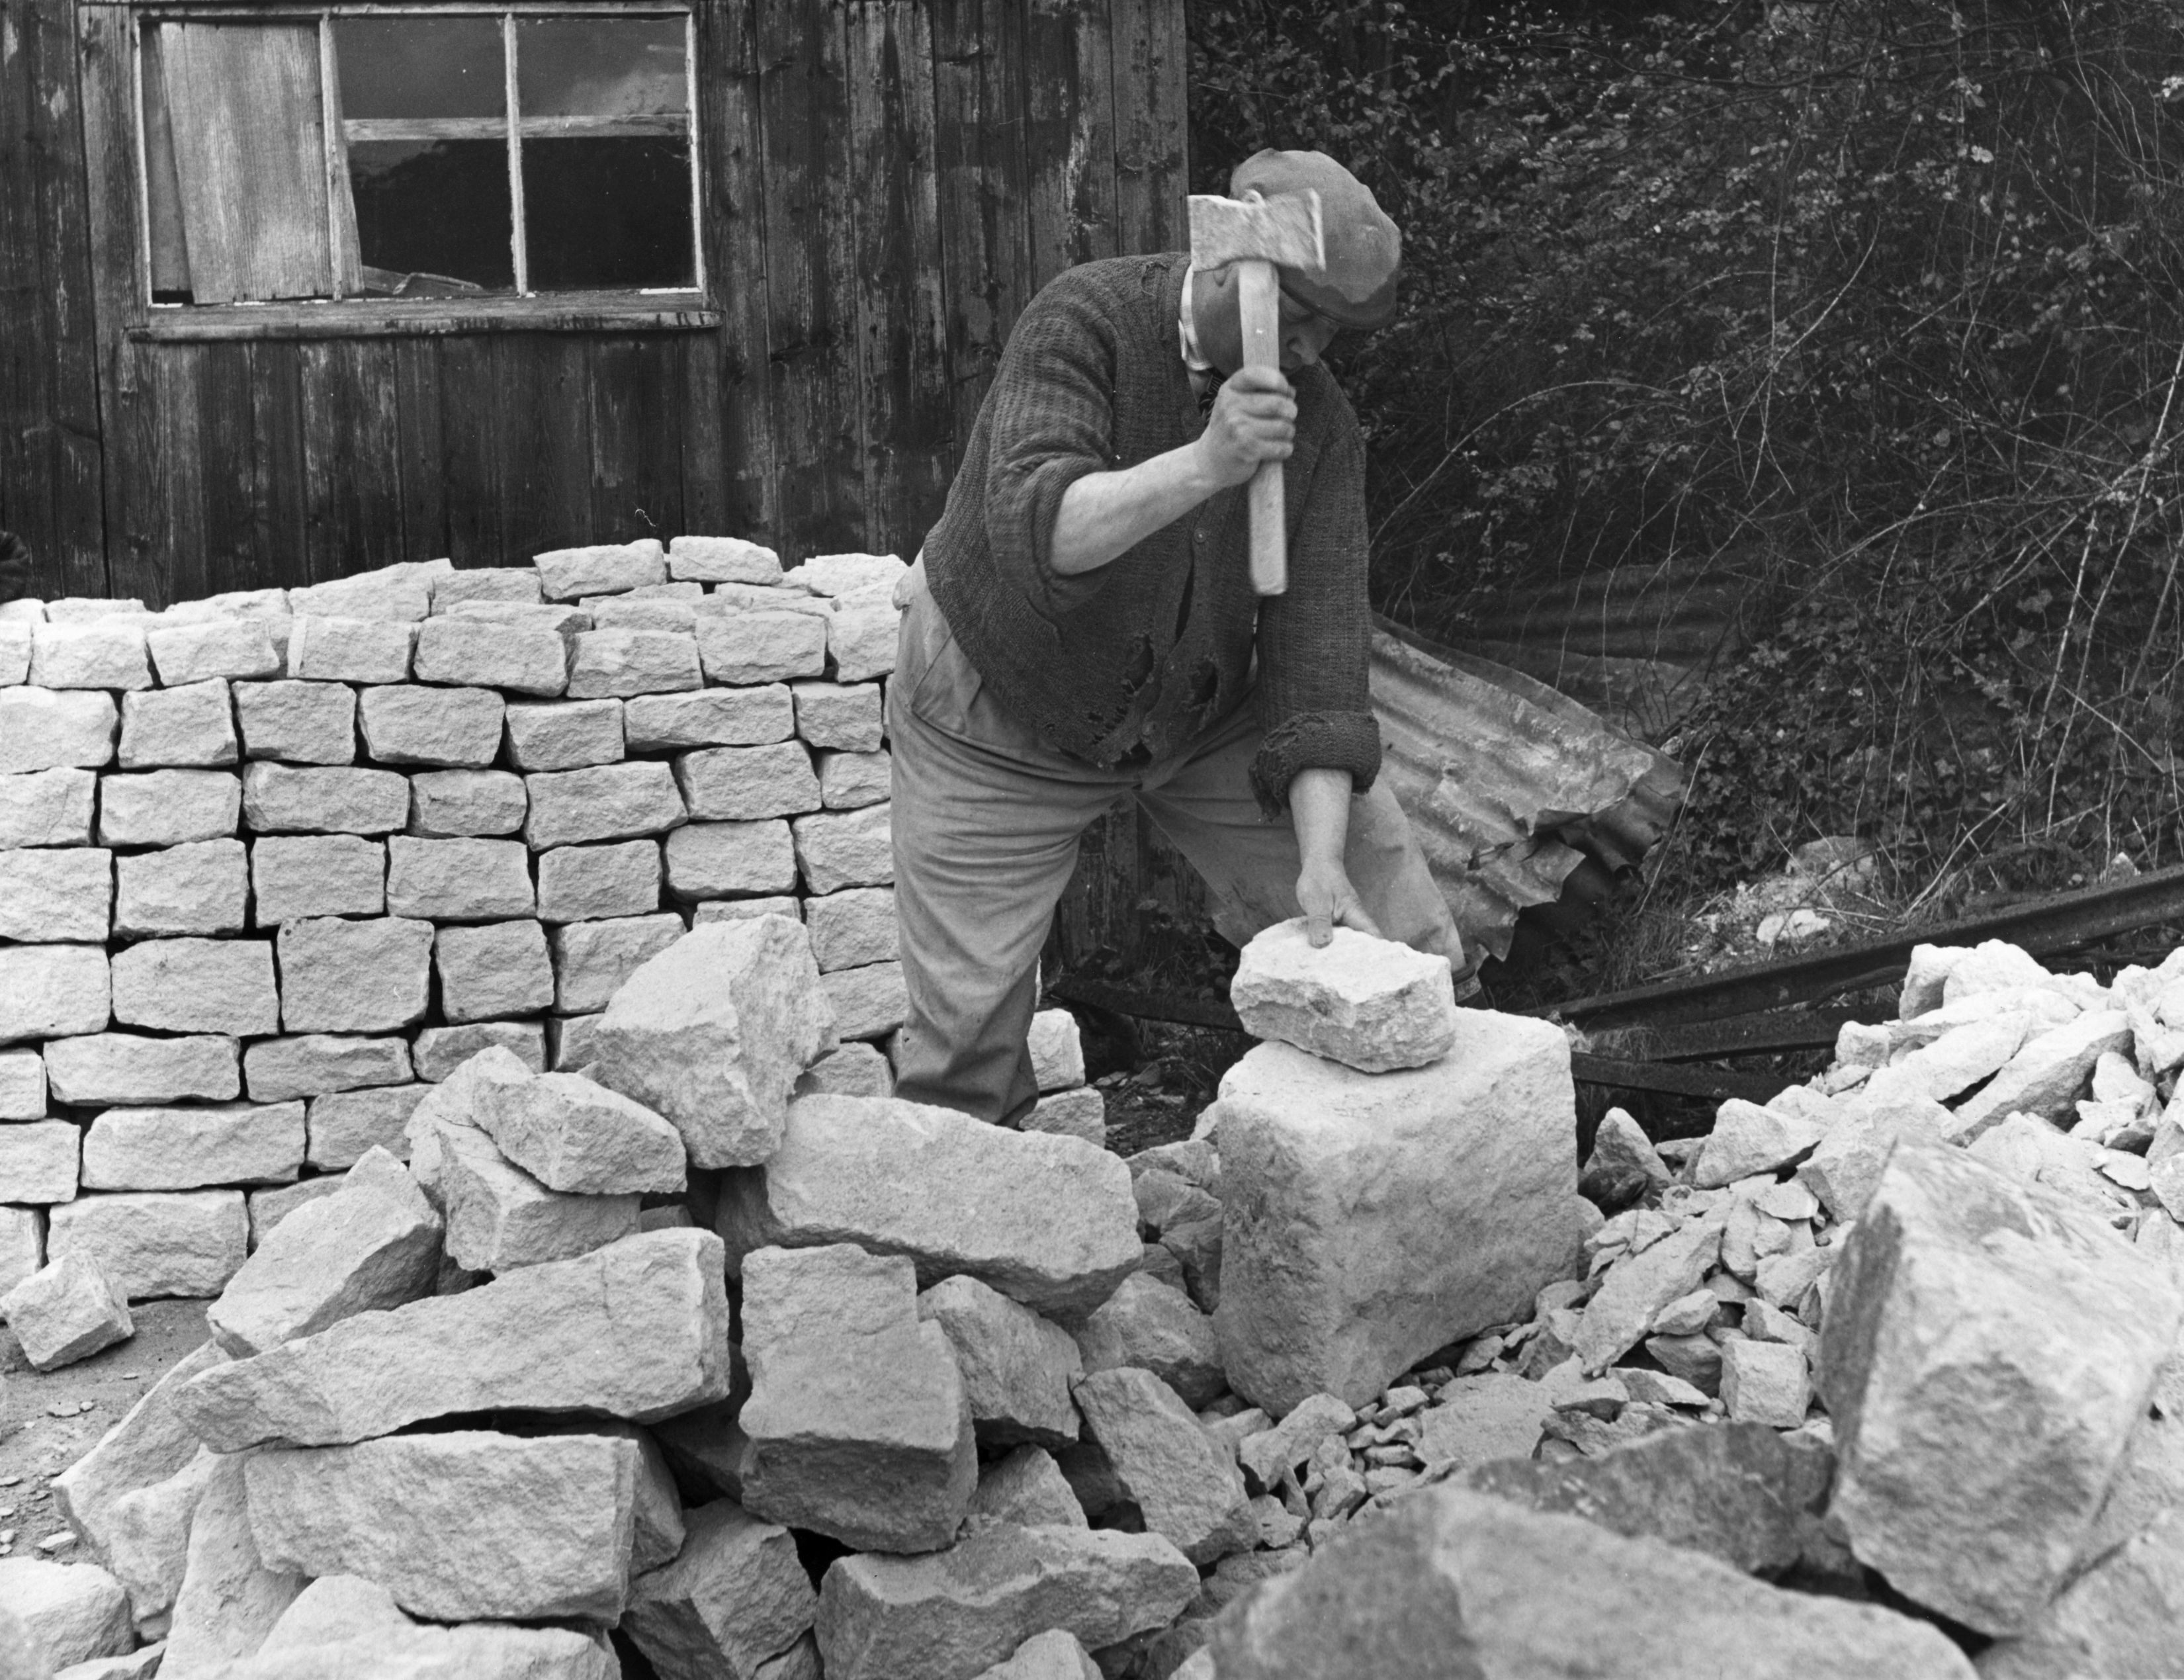 A mason shaping Cotswold stones